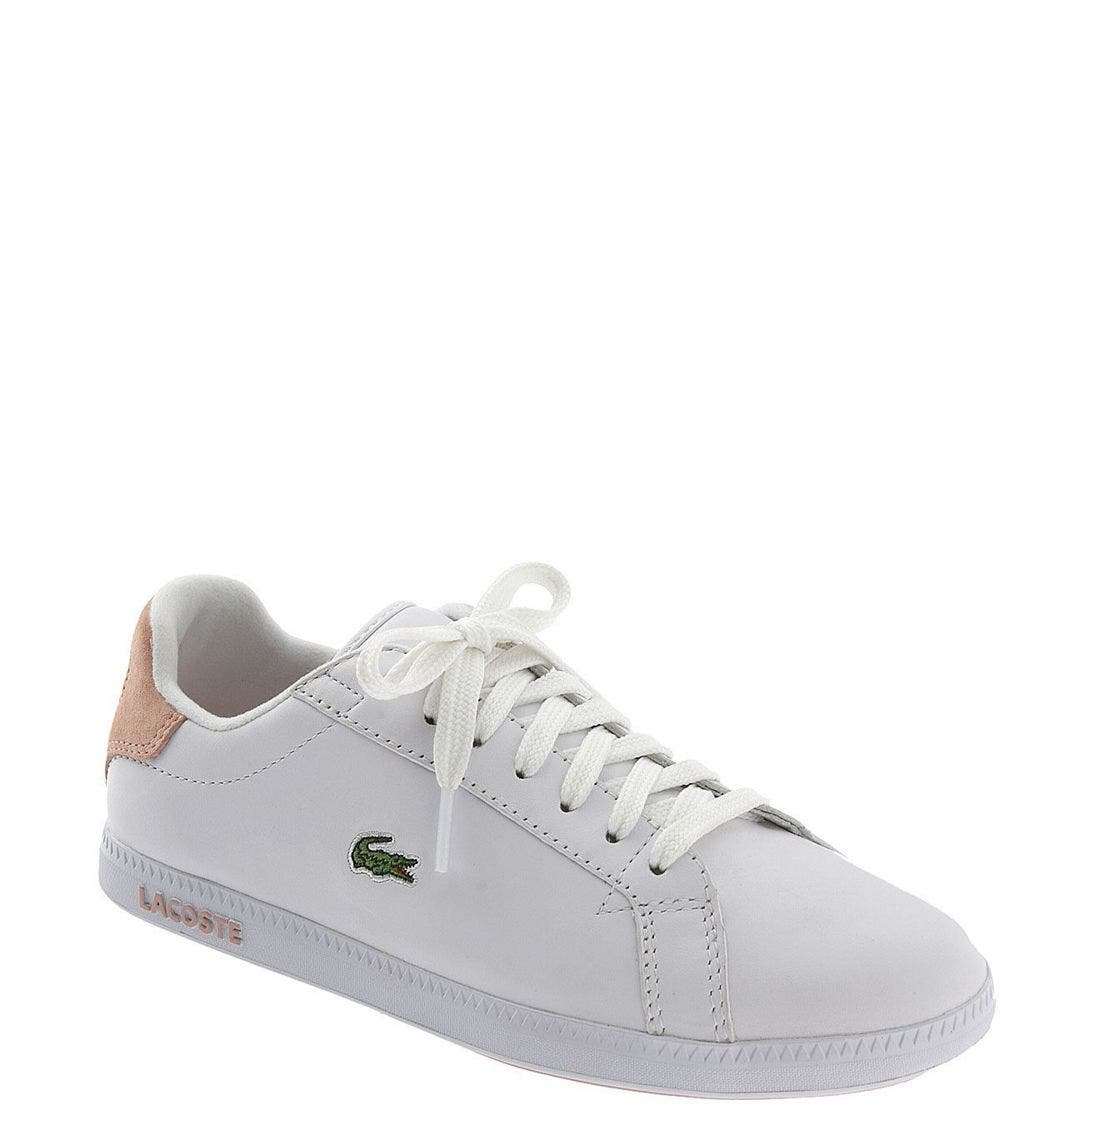 Alternate Image 1 Selected - Lacoste 'Graduate 2' Sneaker (Women)